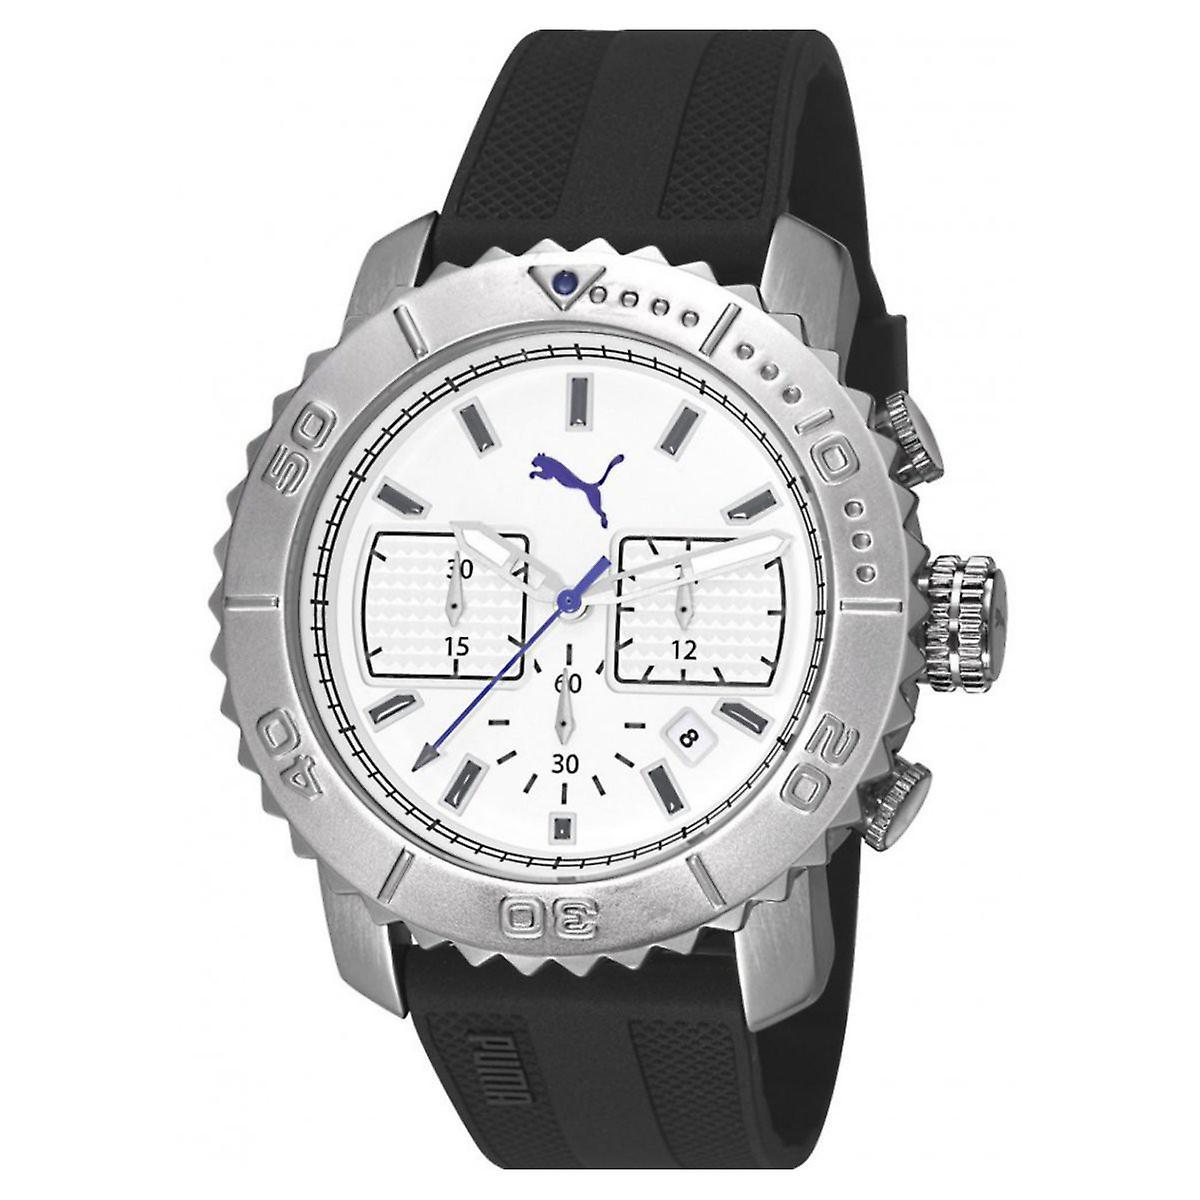 save off 04d2c 7603c プーマ腕時計時計メンズ腕時計クロノ勇敢なシリコーン PU103561002 手首